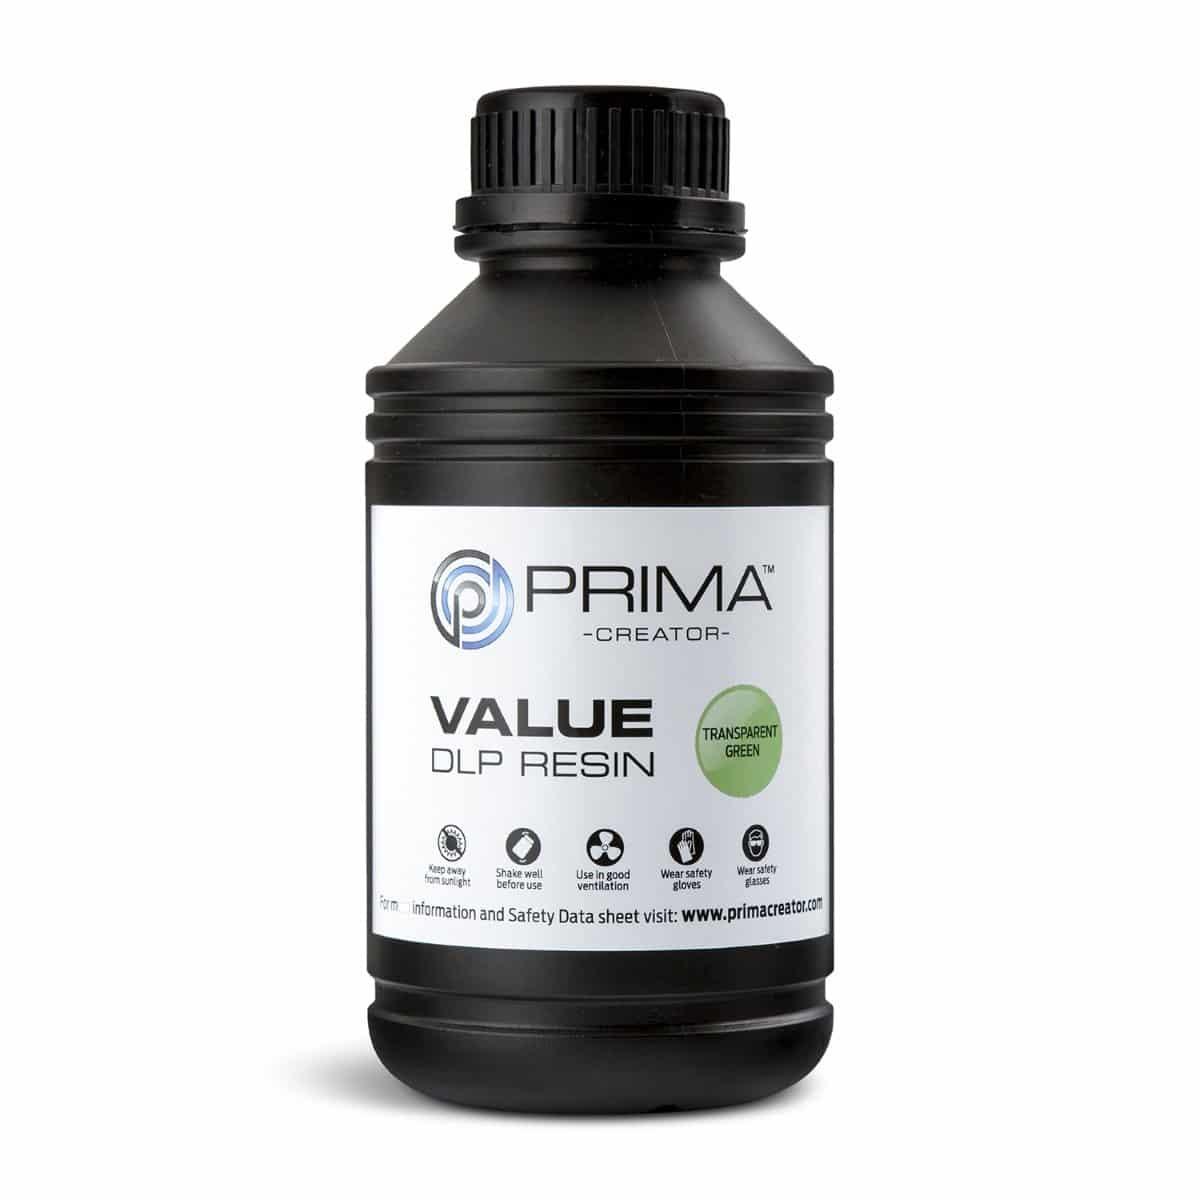 Image of PrimaCreator Value UV / DLP Resin - 500 ml - Transparent Green